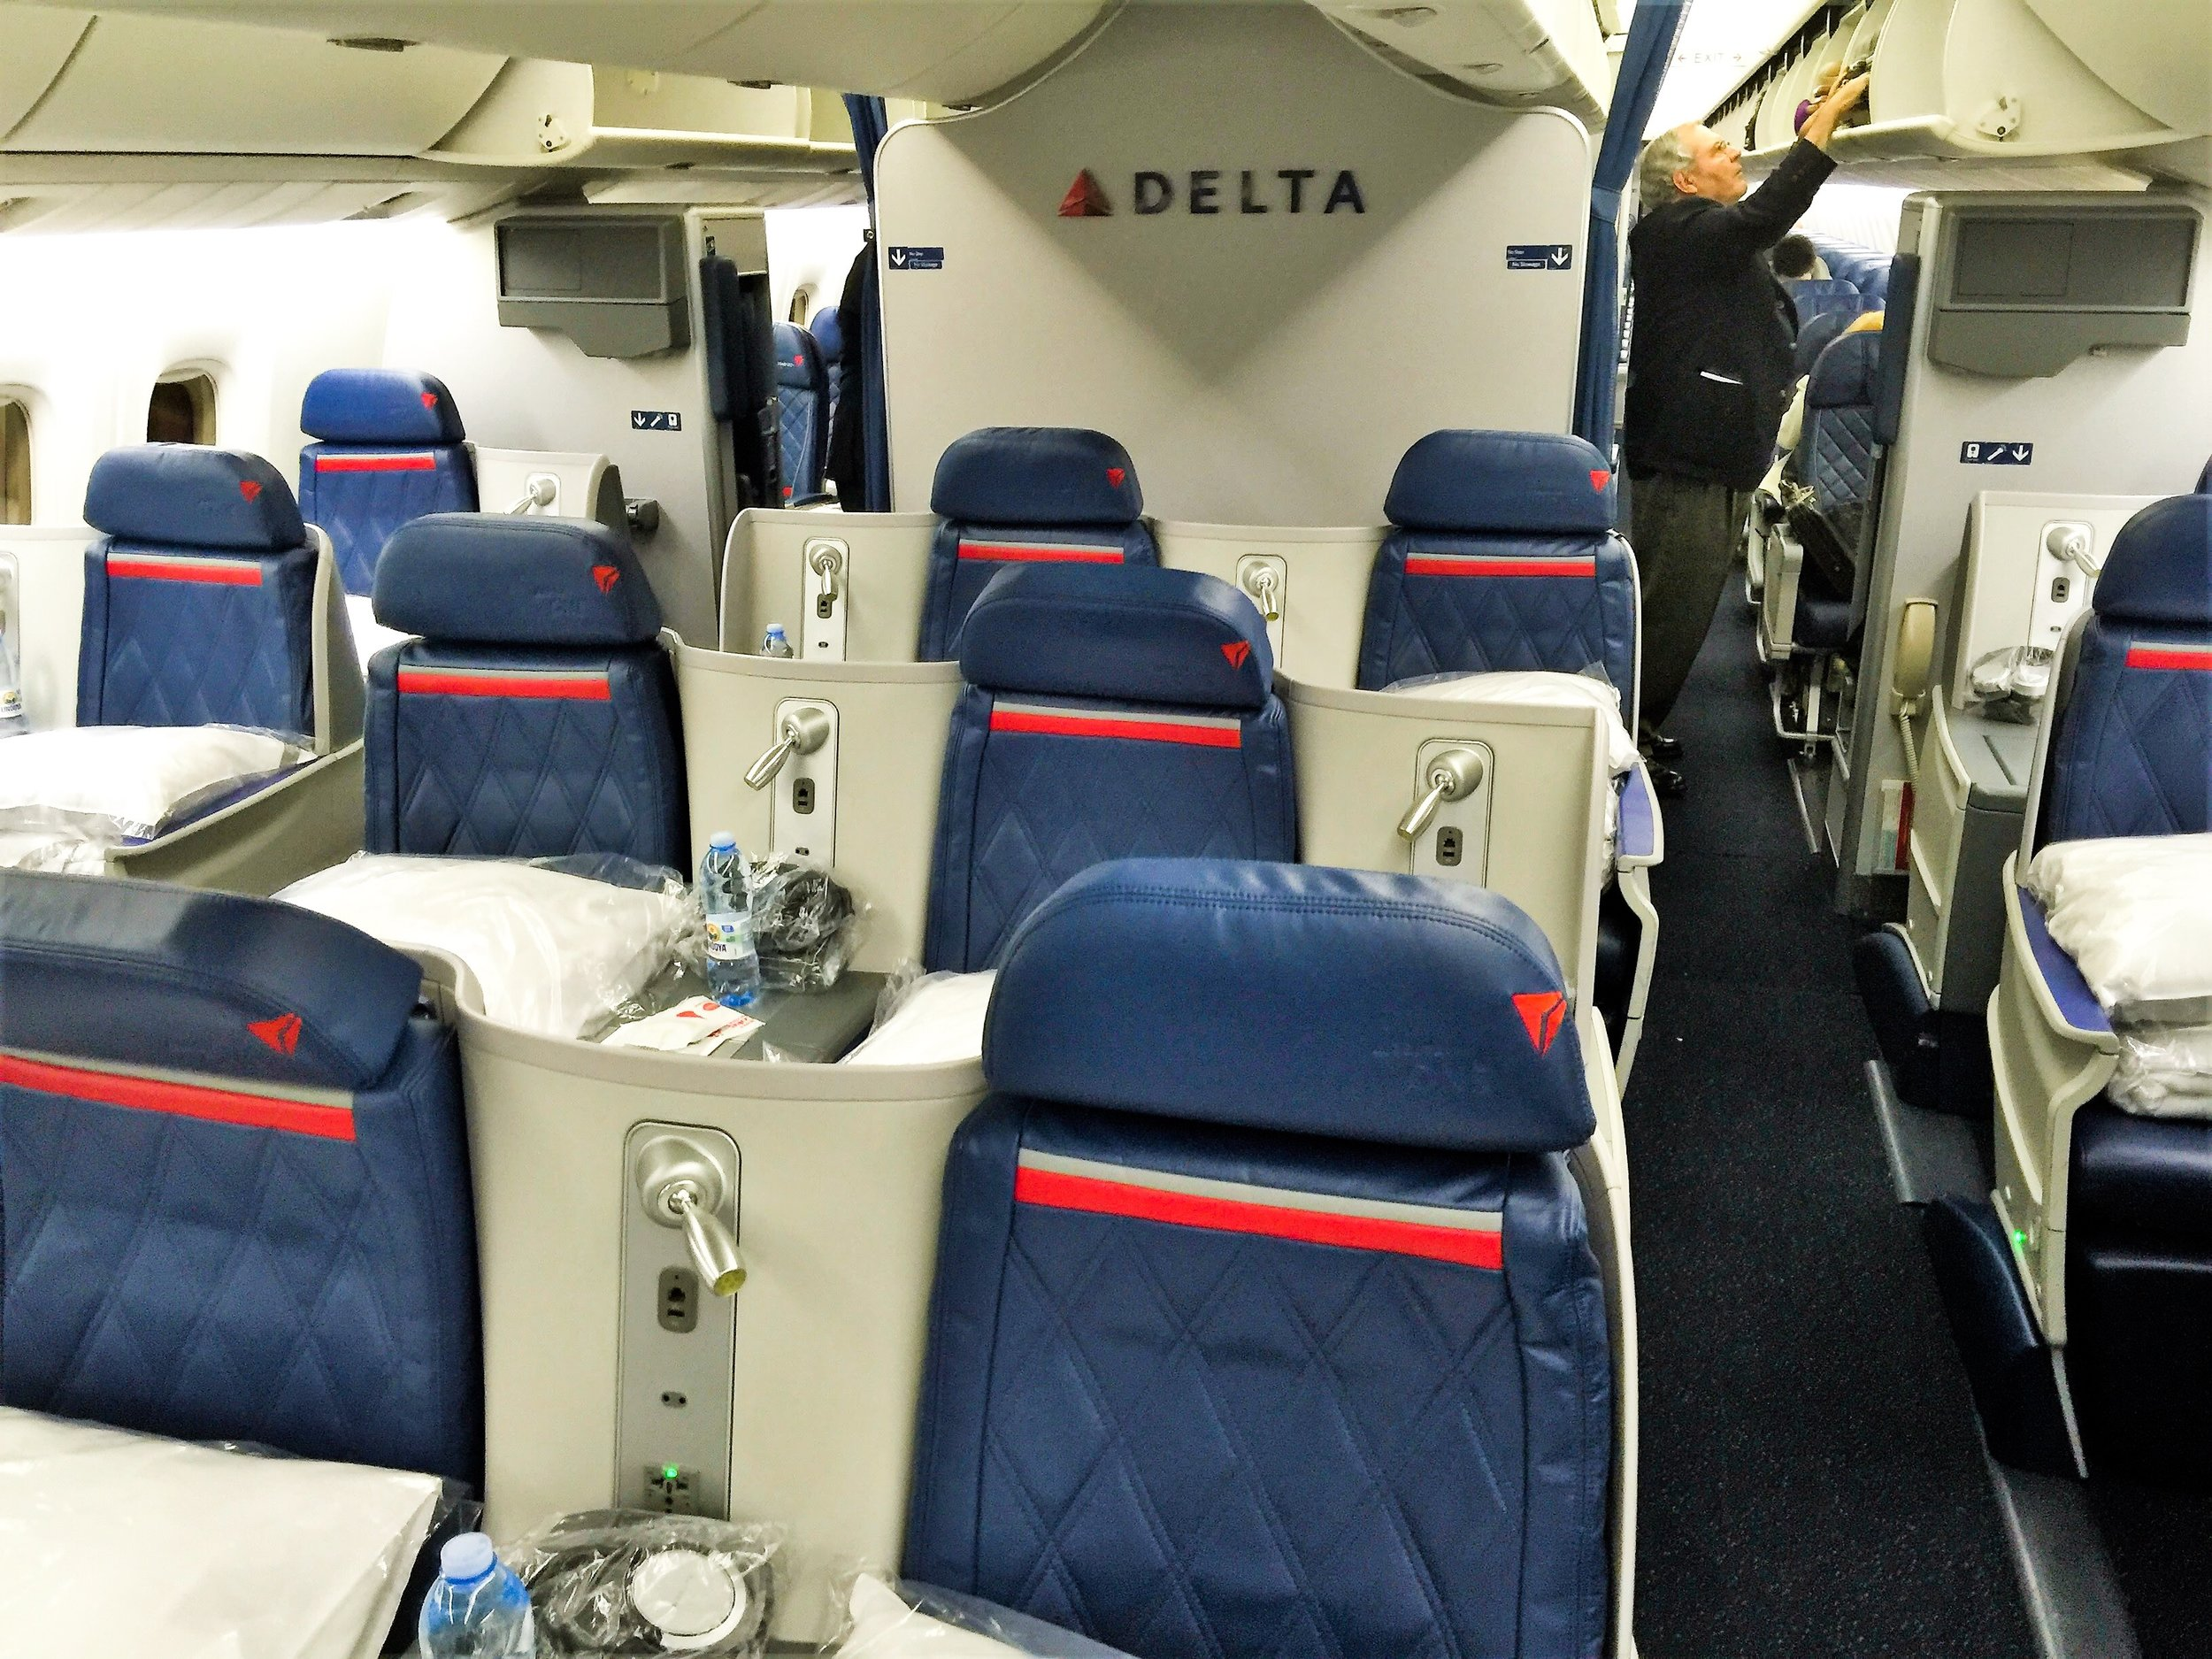 76L - Delta One: 36 SeatsDelta Comfort+: 32 SeatsMain Cabin: 143 Seats